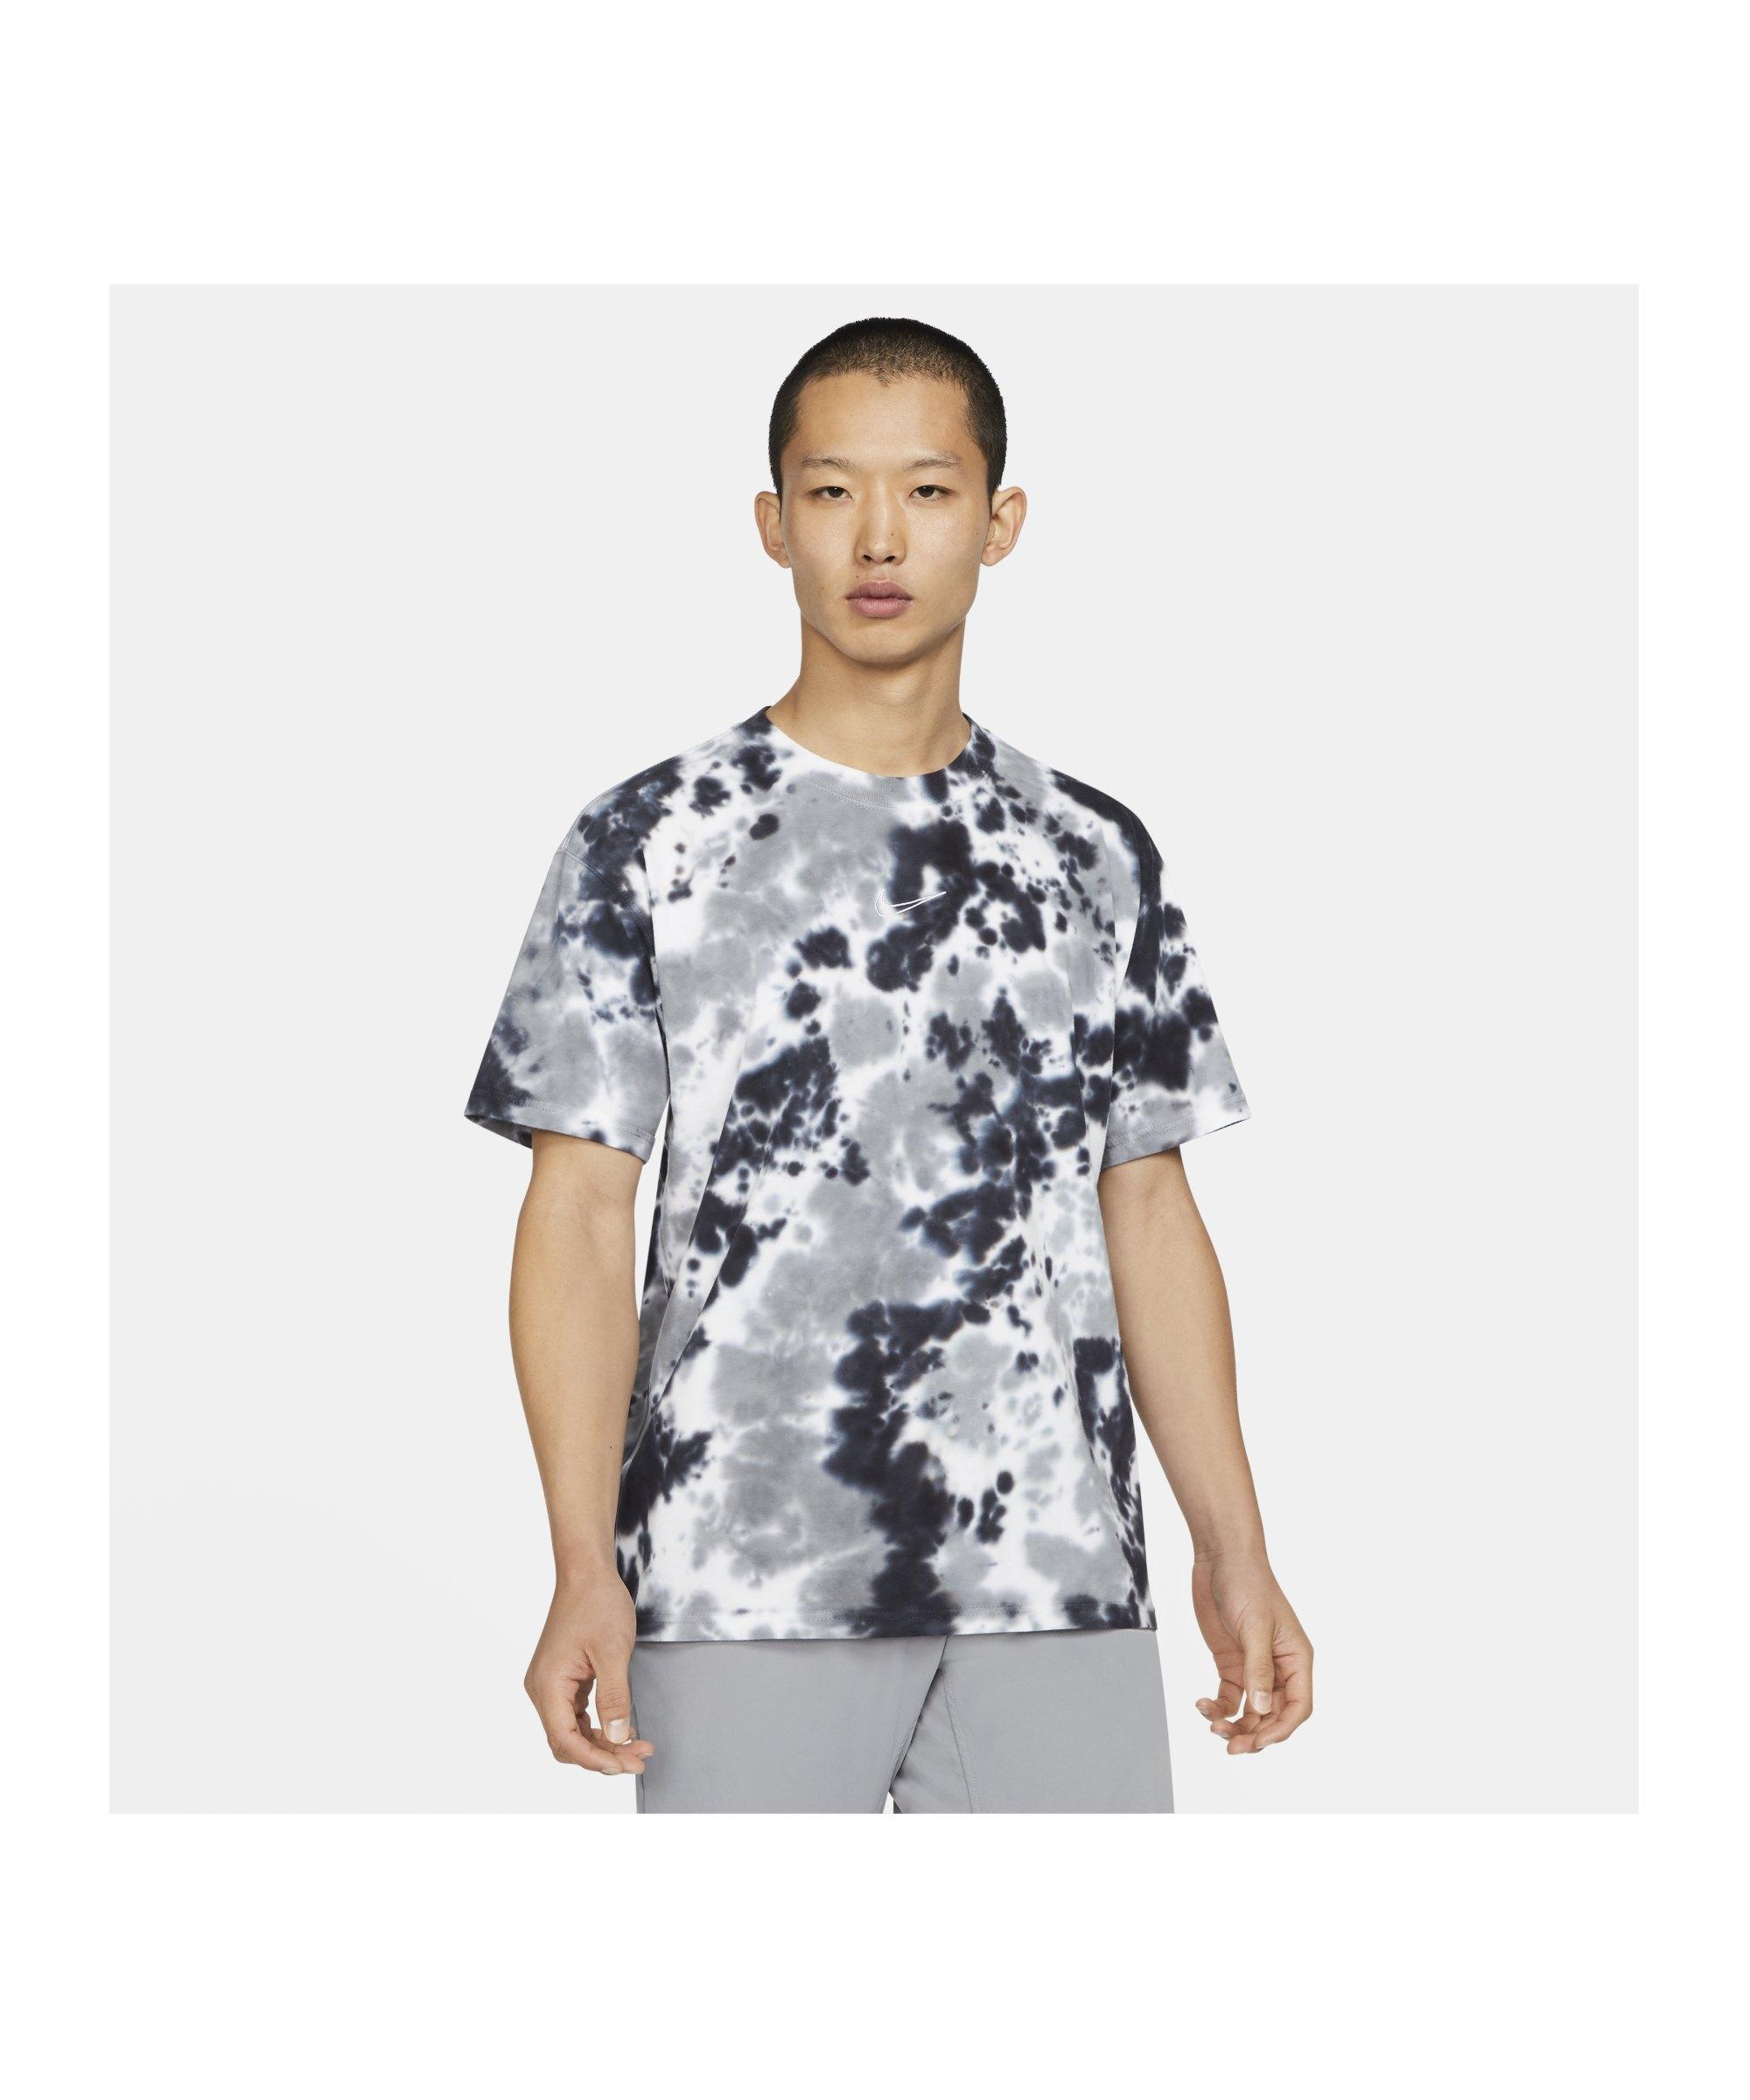 Nike Max 90 Wild Tie Dye T-Shirt Weiss Grau F101 - weiss